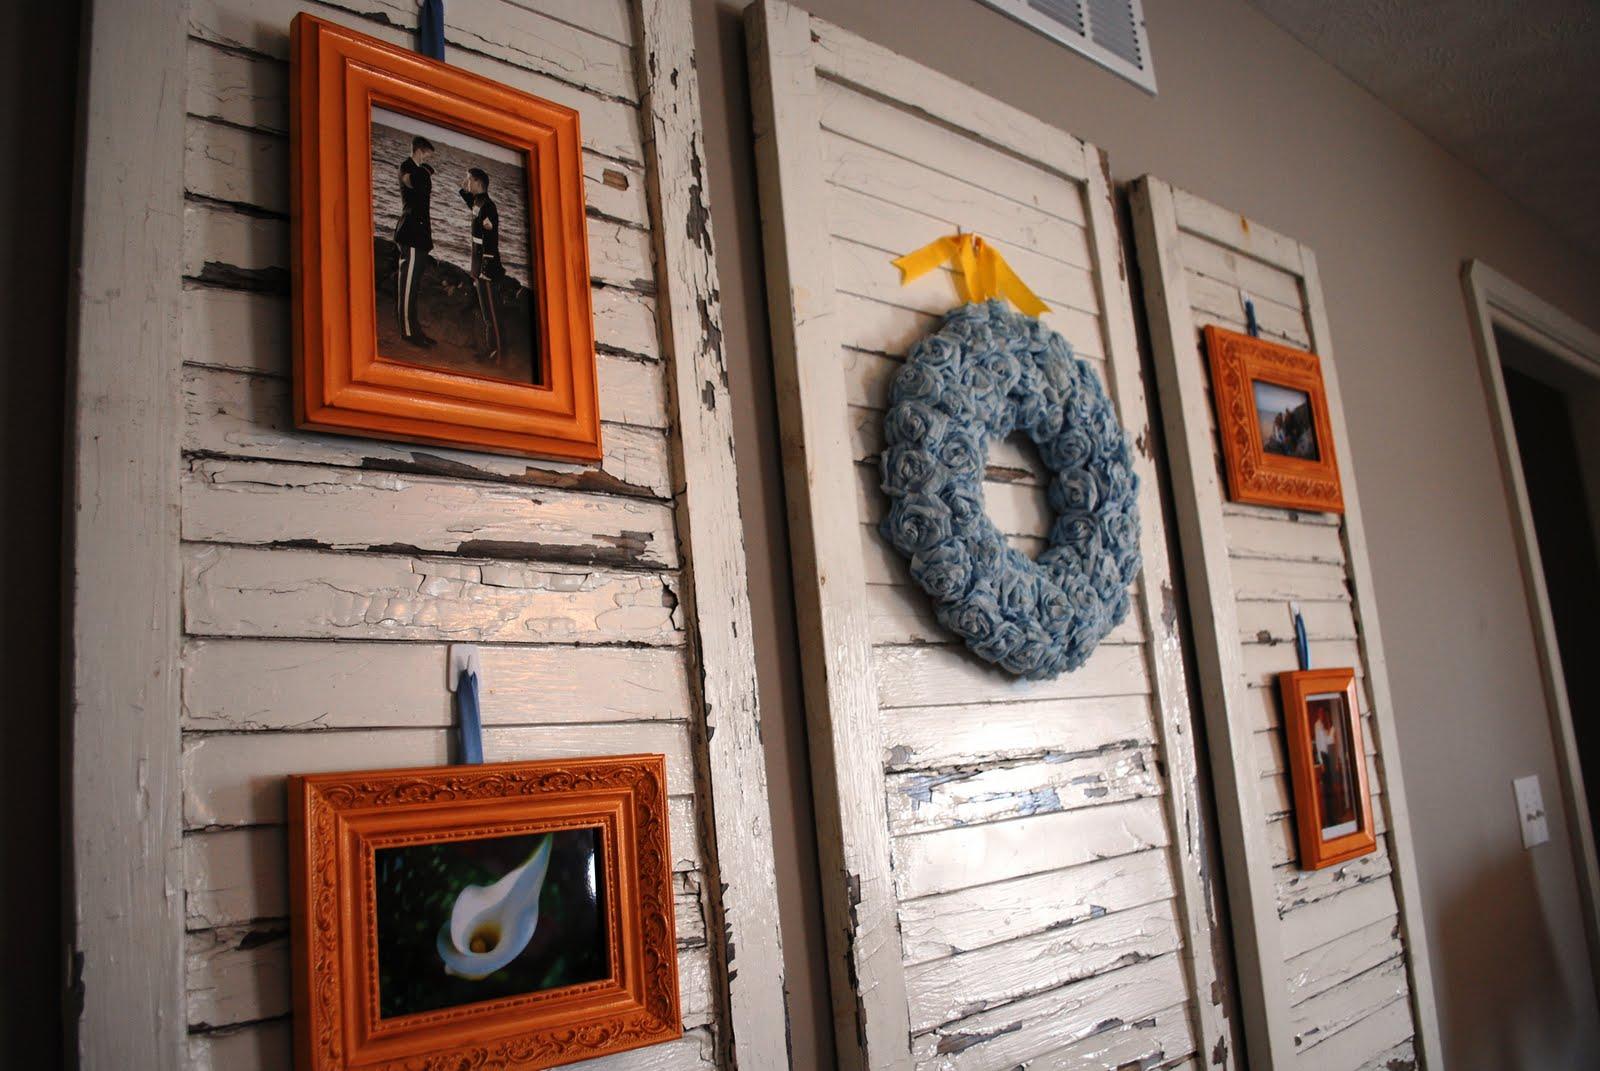 Winners Of The Frames, Art & Wall Decor Challenge!